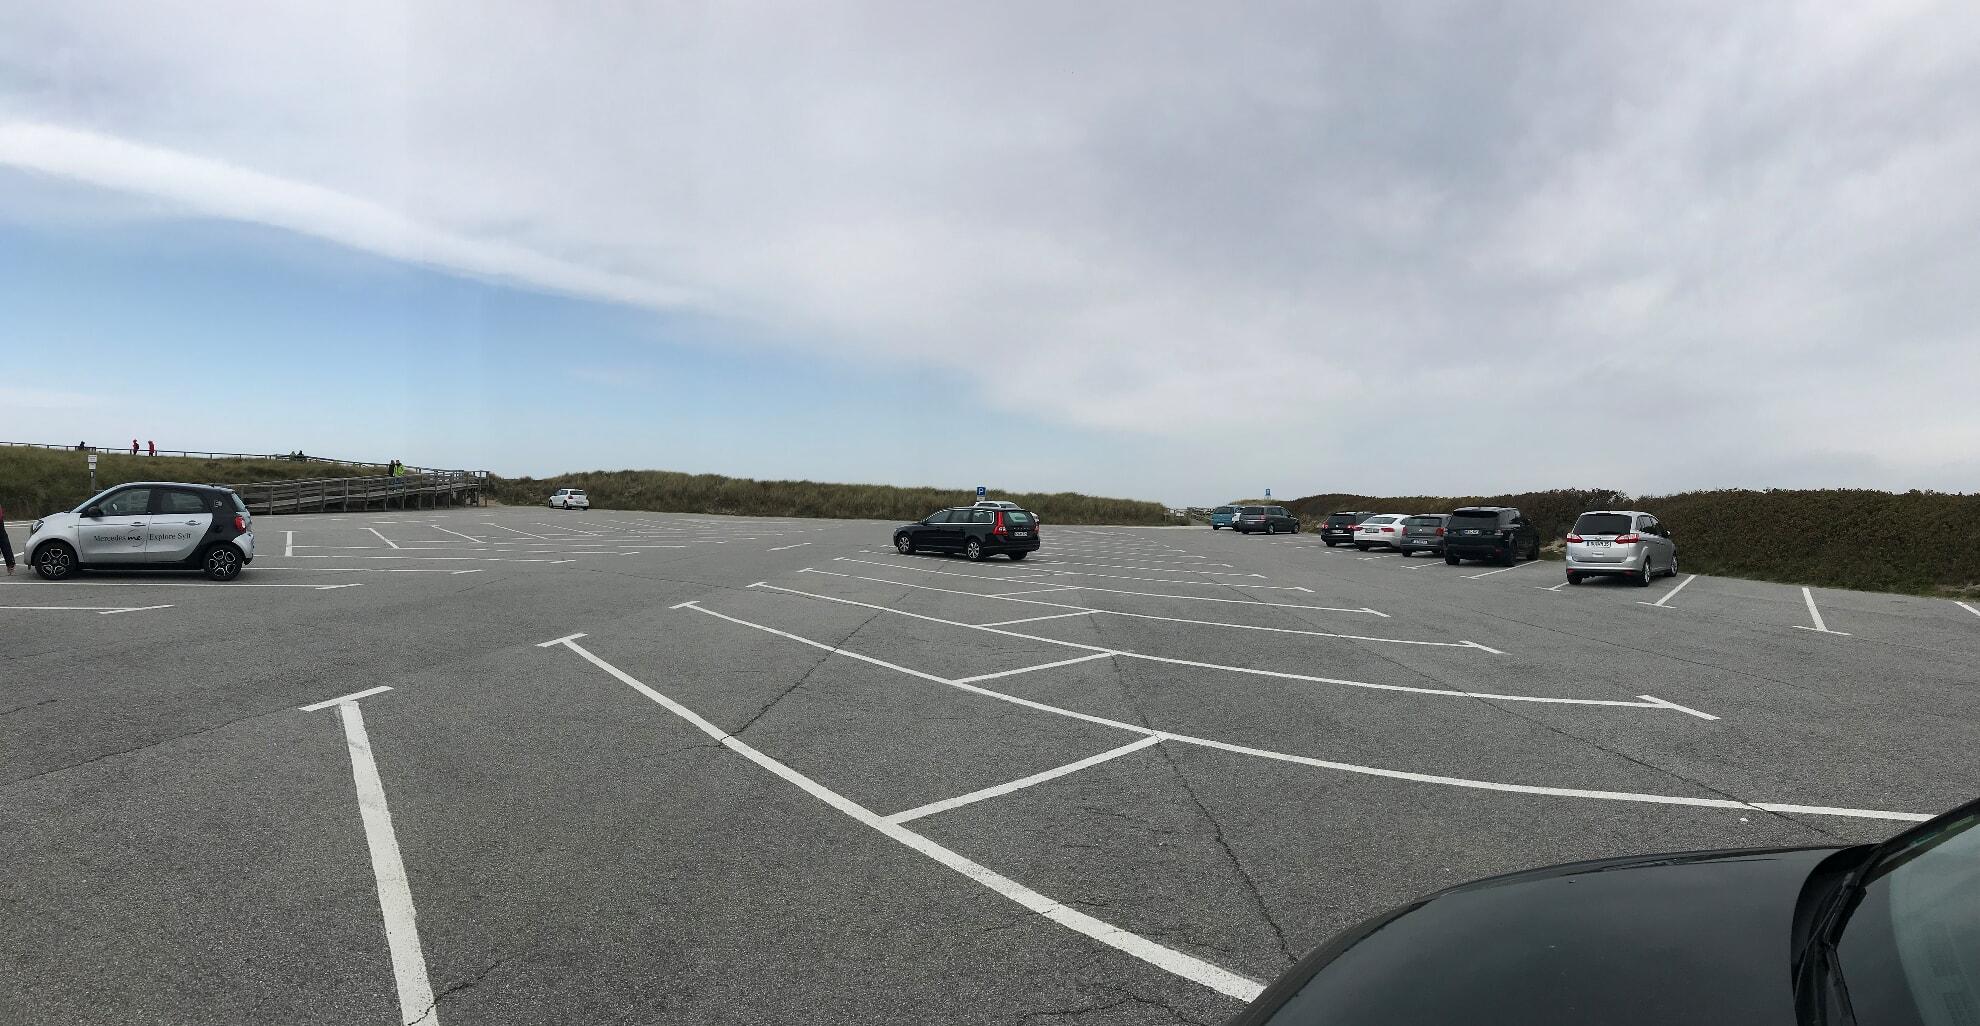 Parkplätze am Strandübergang Sturmhaube in Kampen